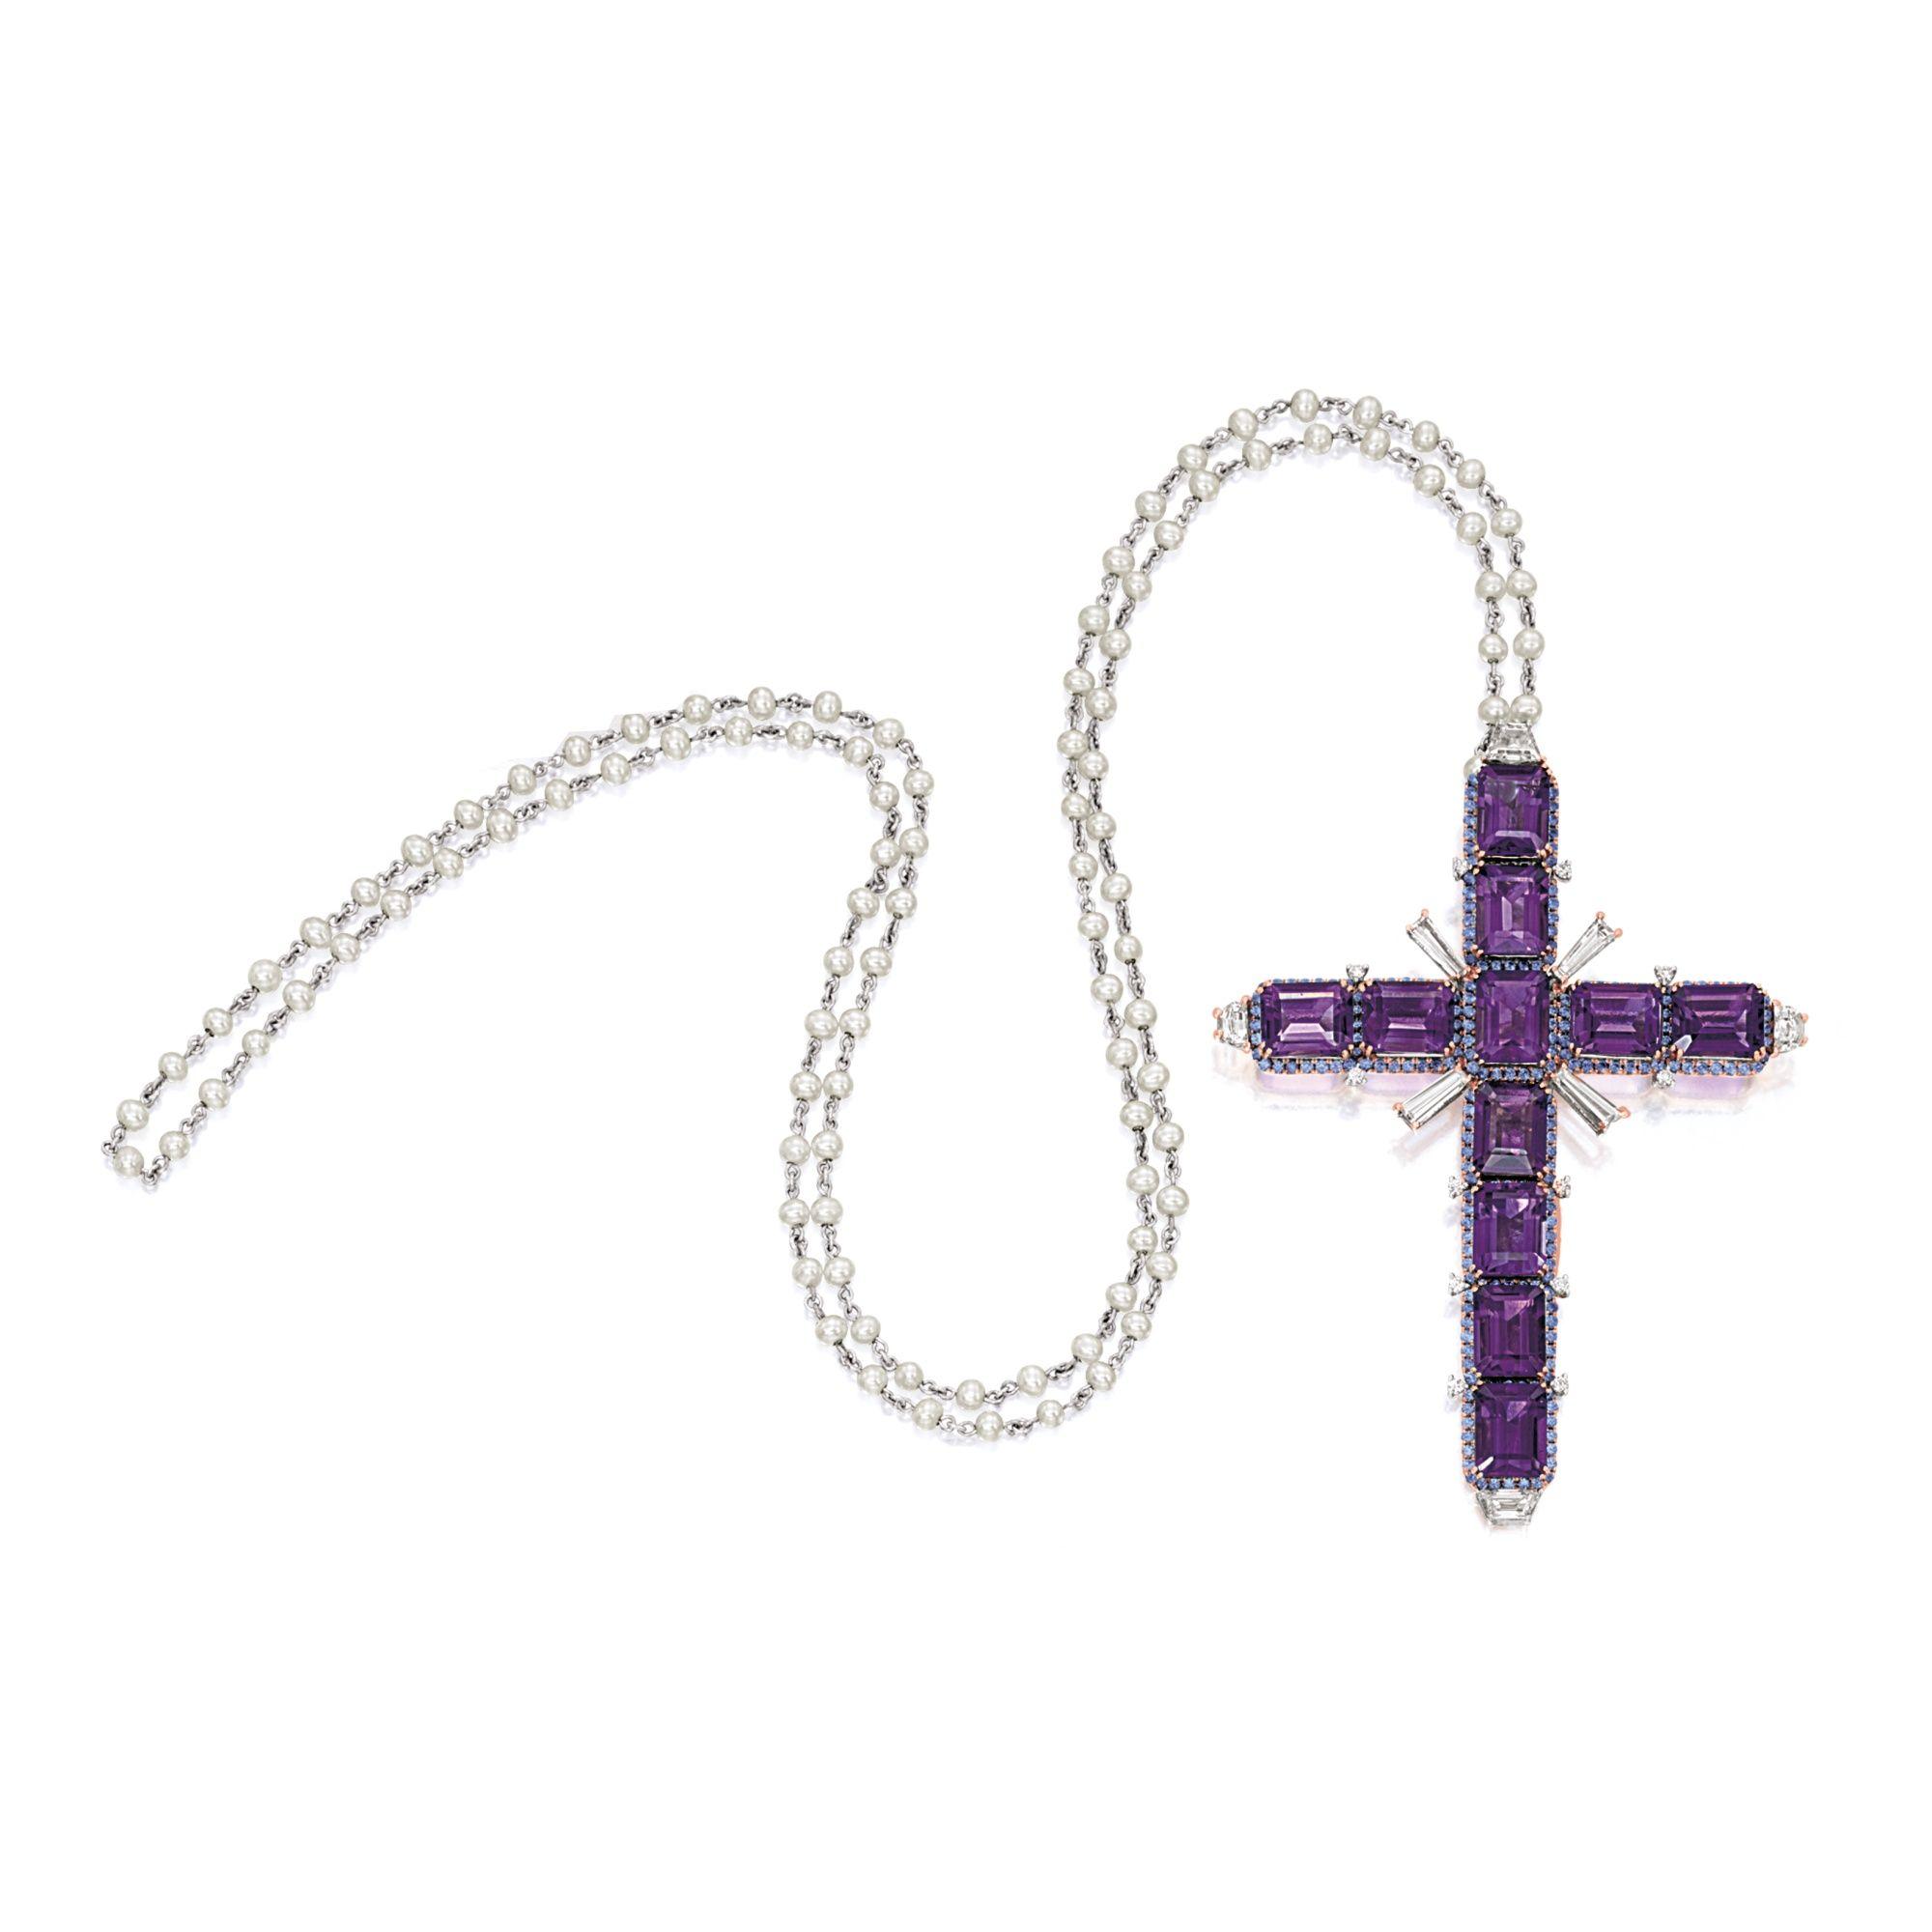 Amethyst diamond and gemset ucrossu pendant necklace lot